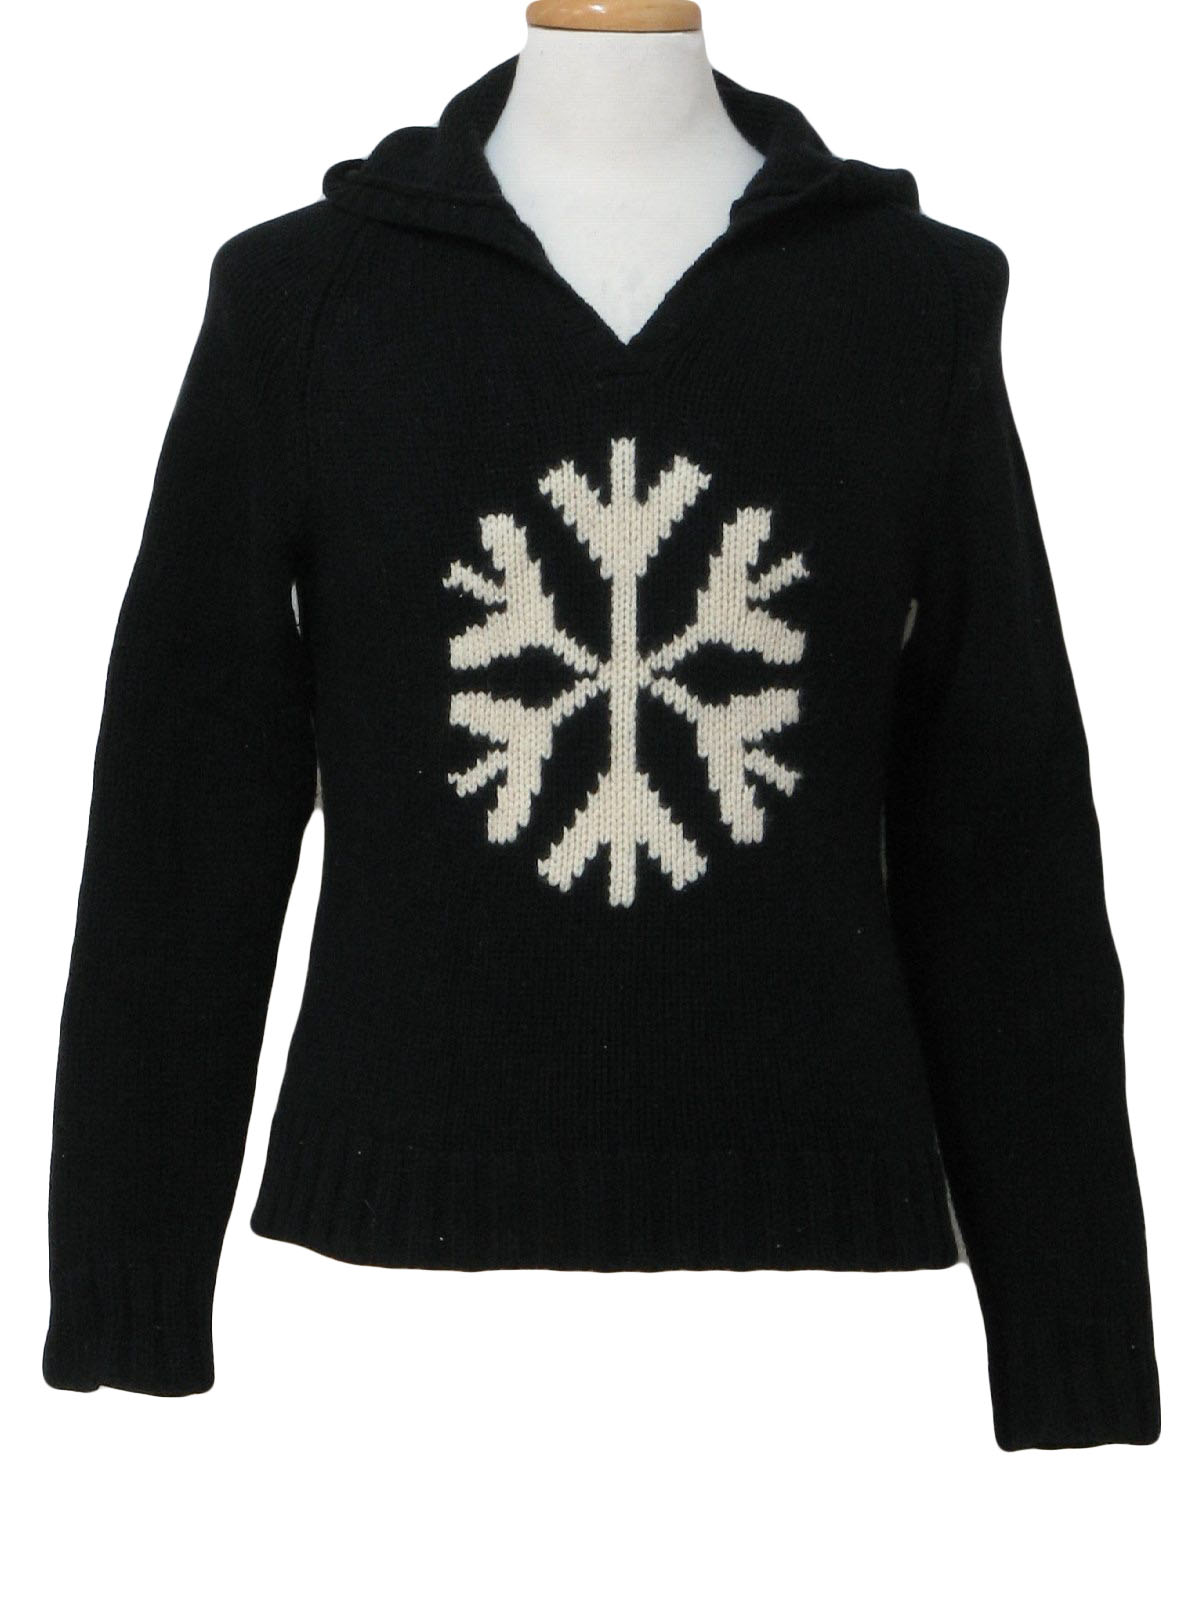 Womenschilds Ugly Christmas Sweater Gap Girlschilds Black And